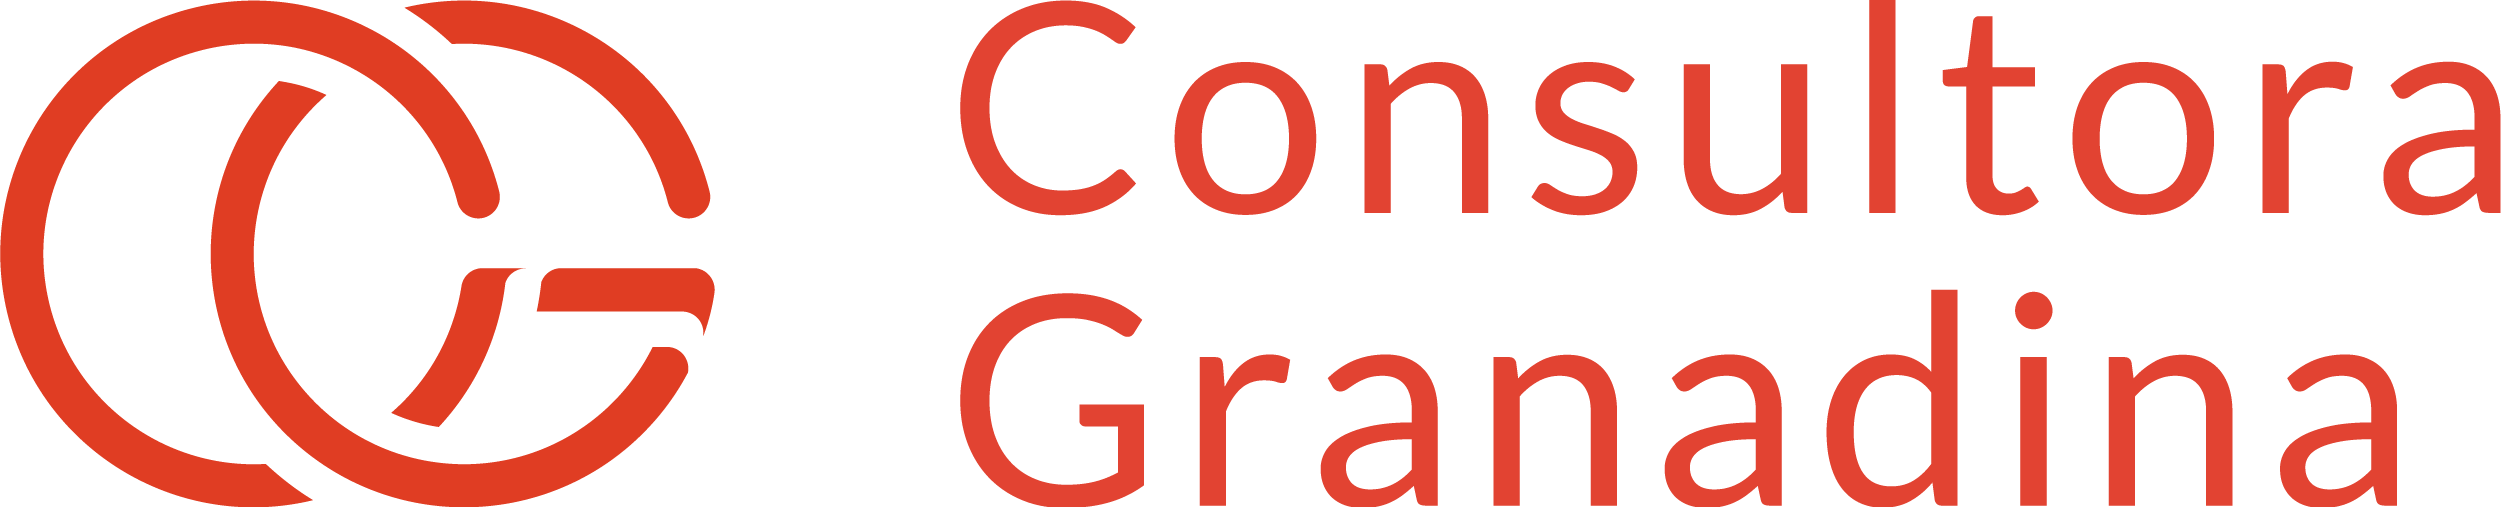 Consultora Granadina